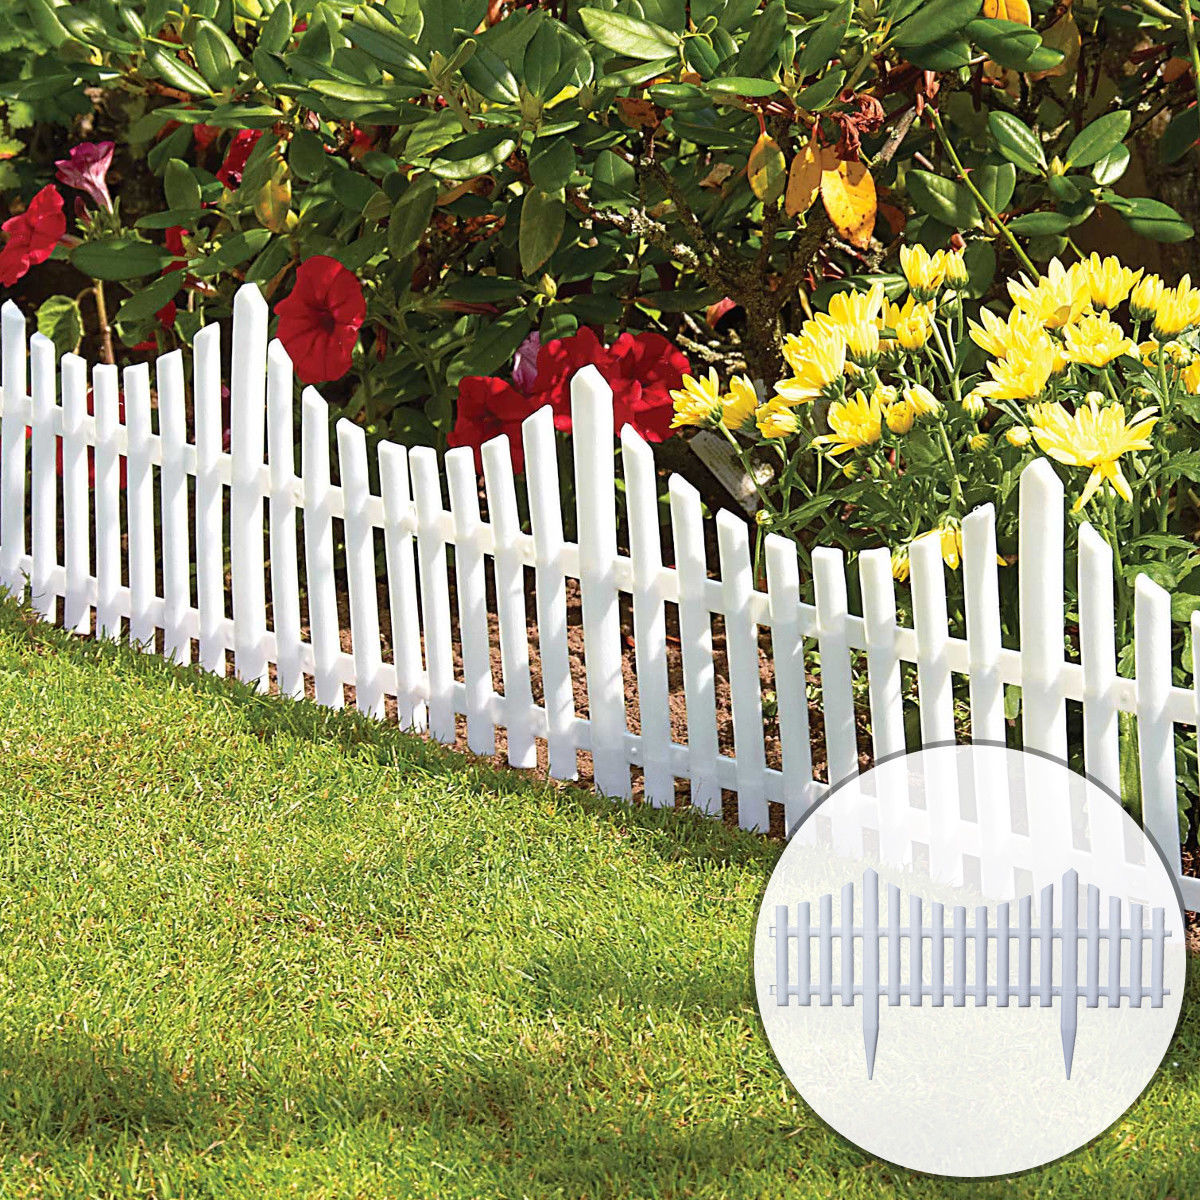 4 Interlocking Garden Picket Fence Patio Borders Path Edging Landscaping.